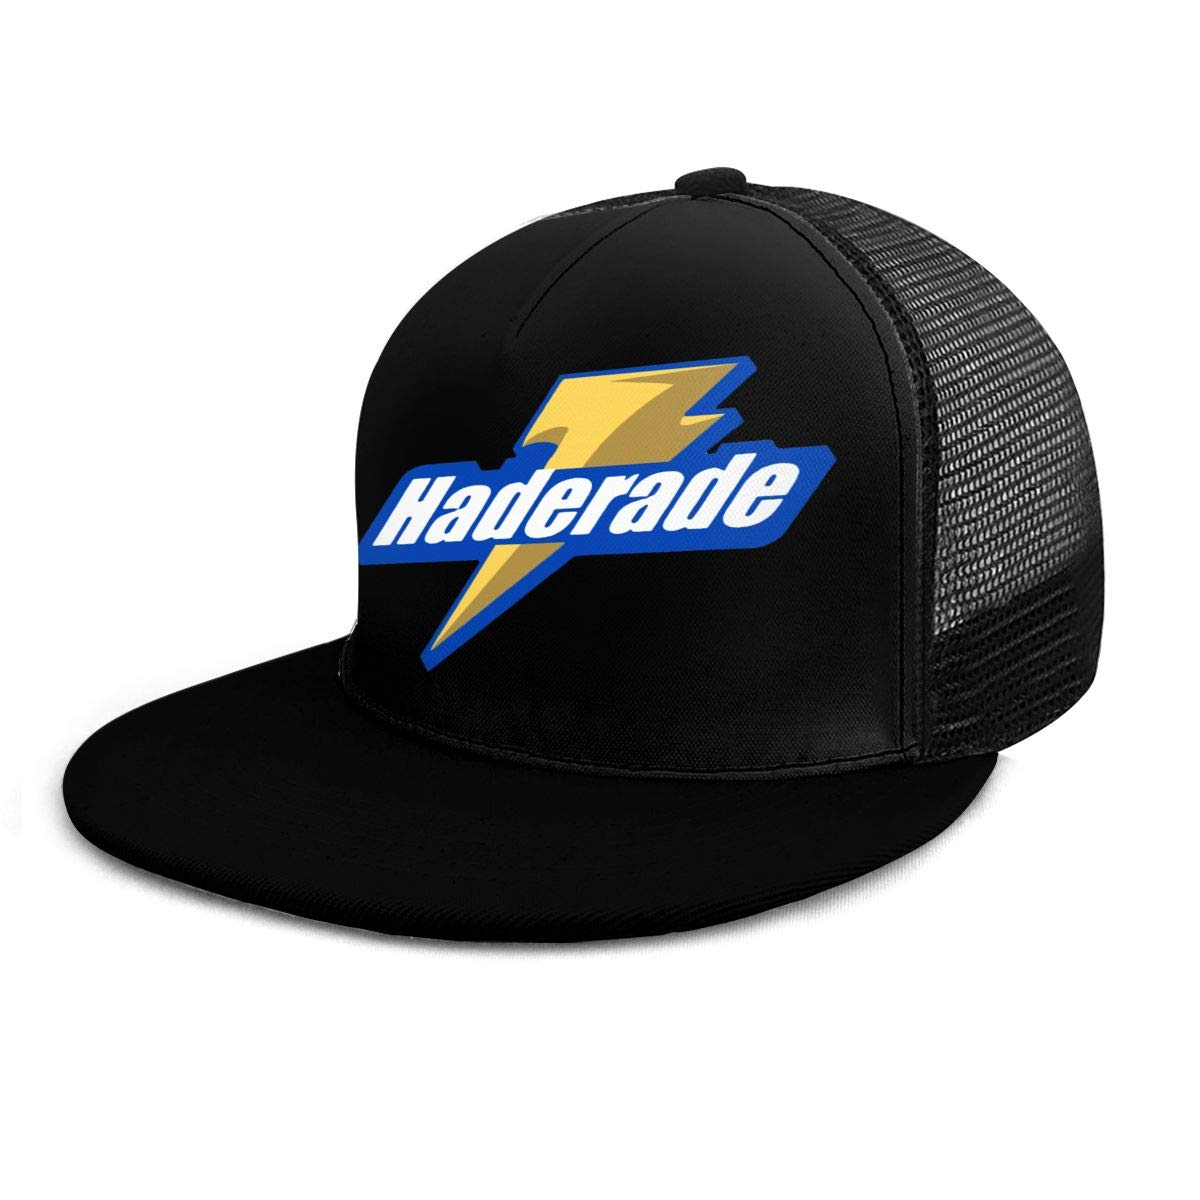 Casual Plain Milwaukee Haderade Dad Hats Unisex Adjustable Baseball Cap Black